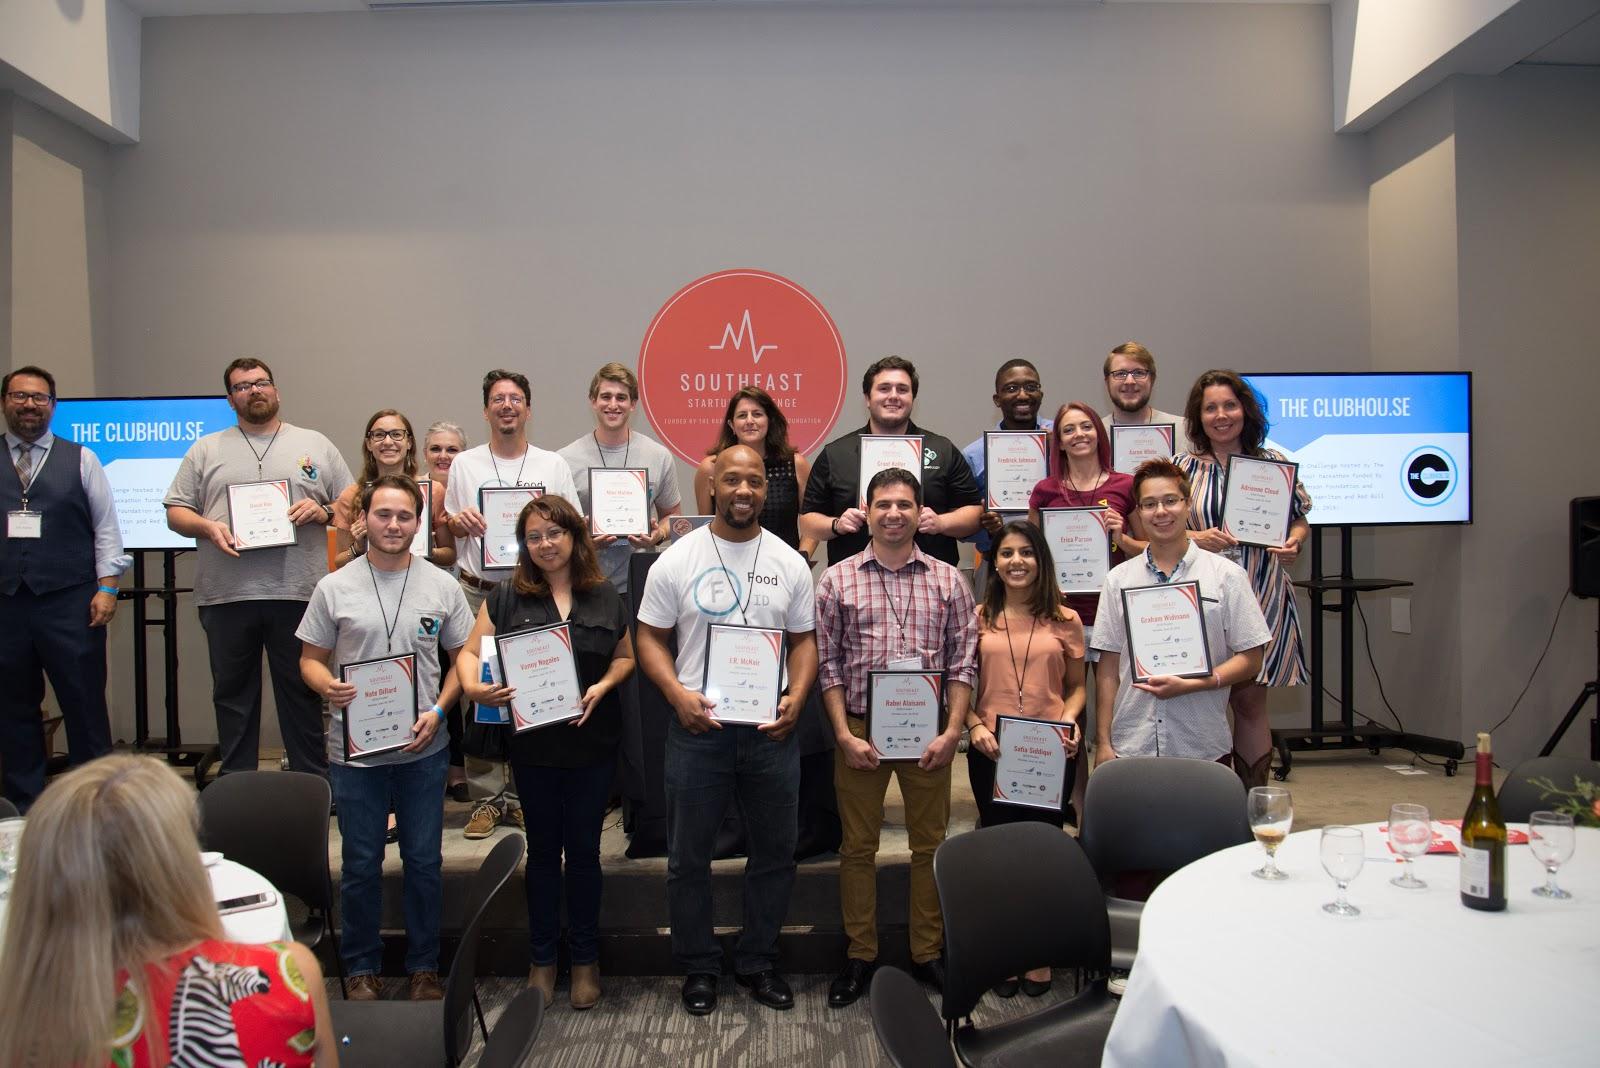 Improving Community health through entrepreneurship - Southeast Startup Challenge